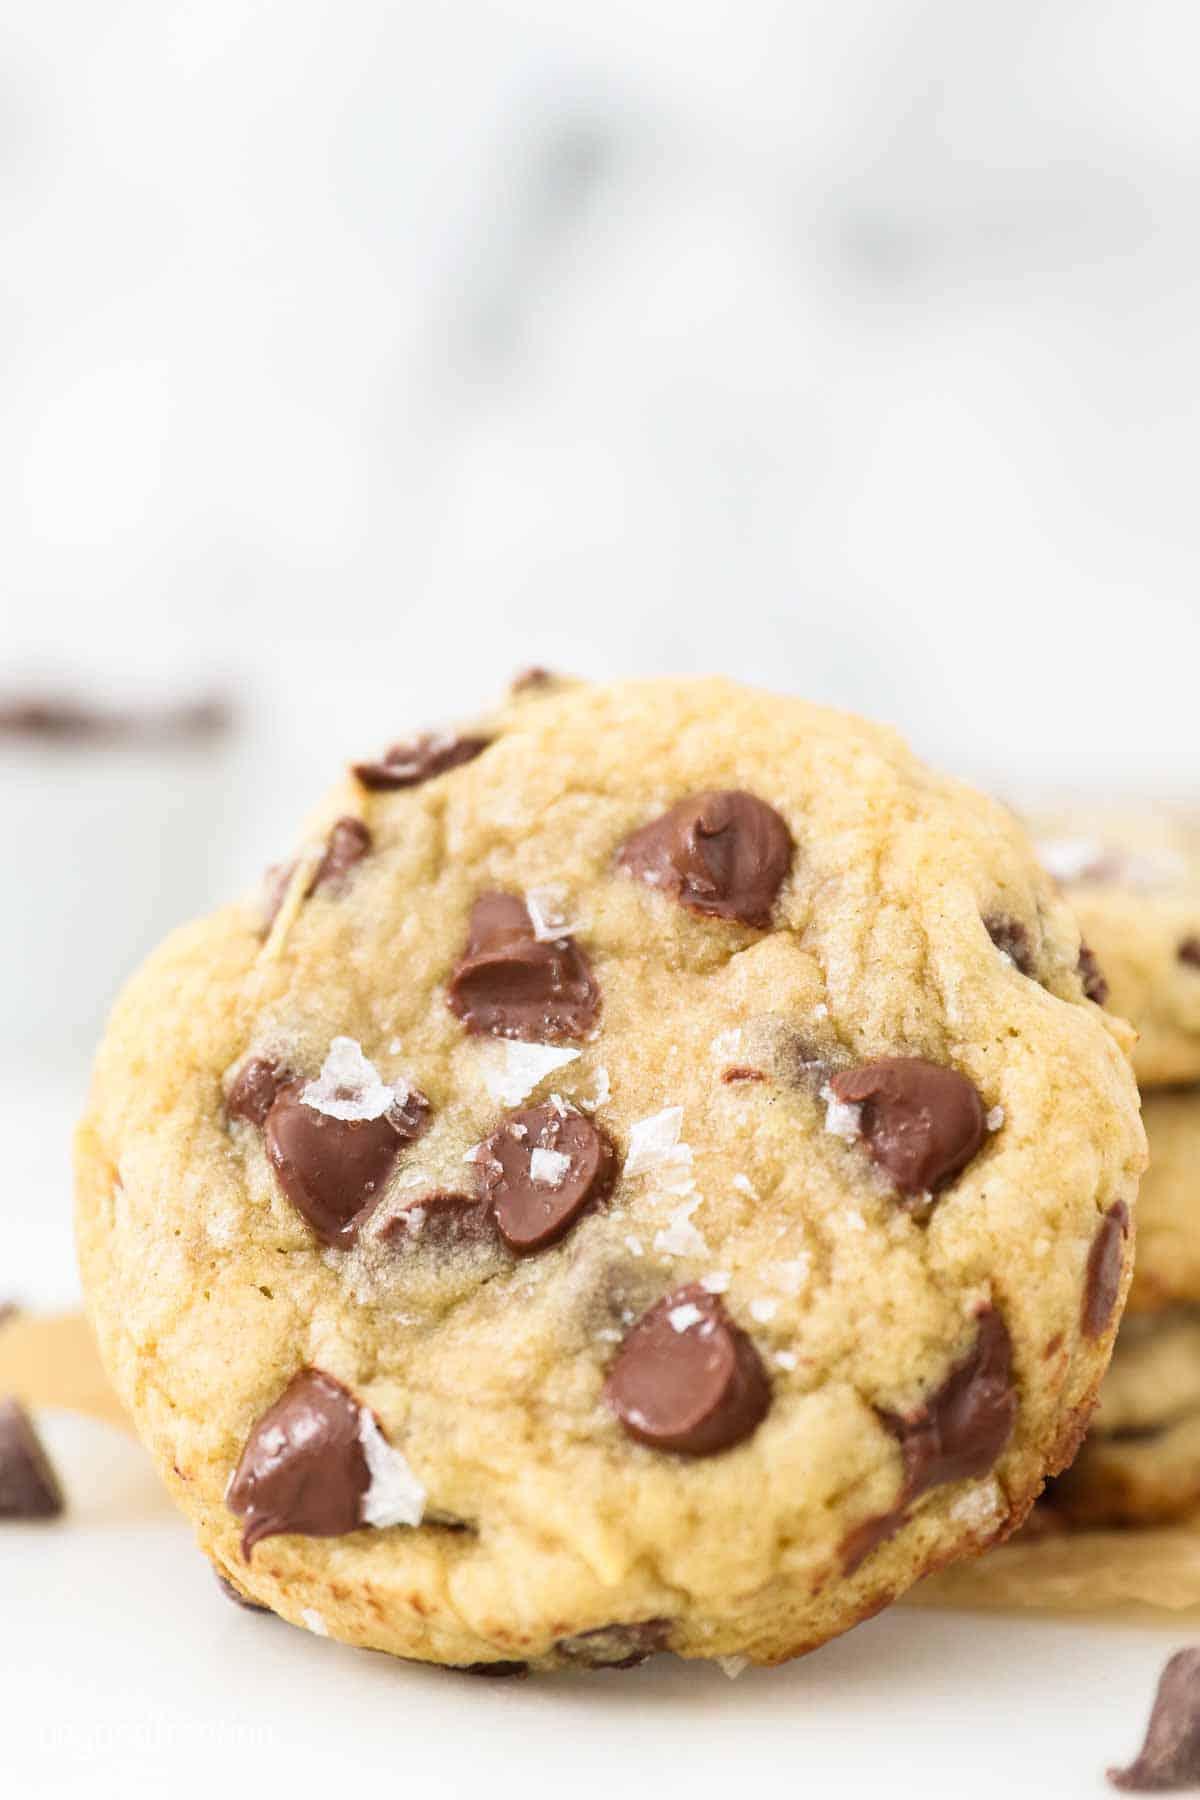 A gluten-free chocolate chip cookie